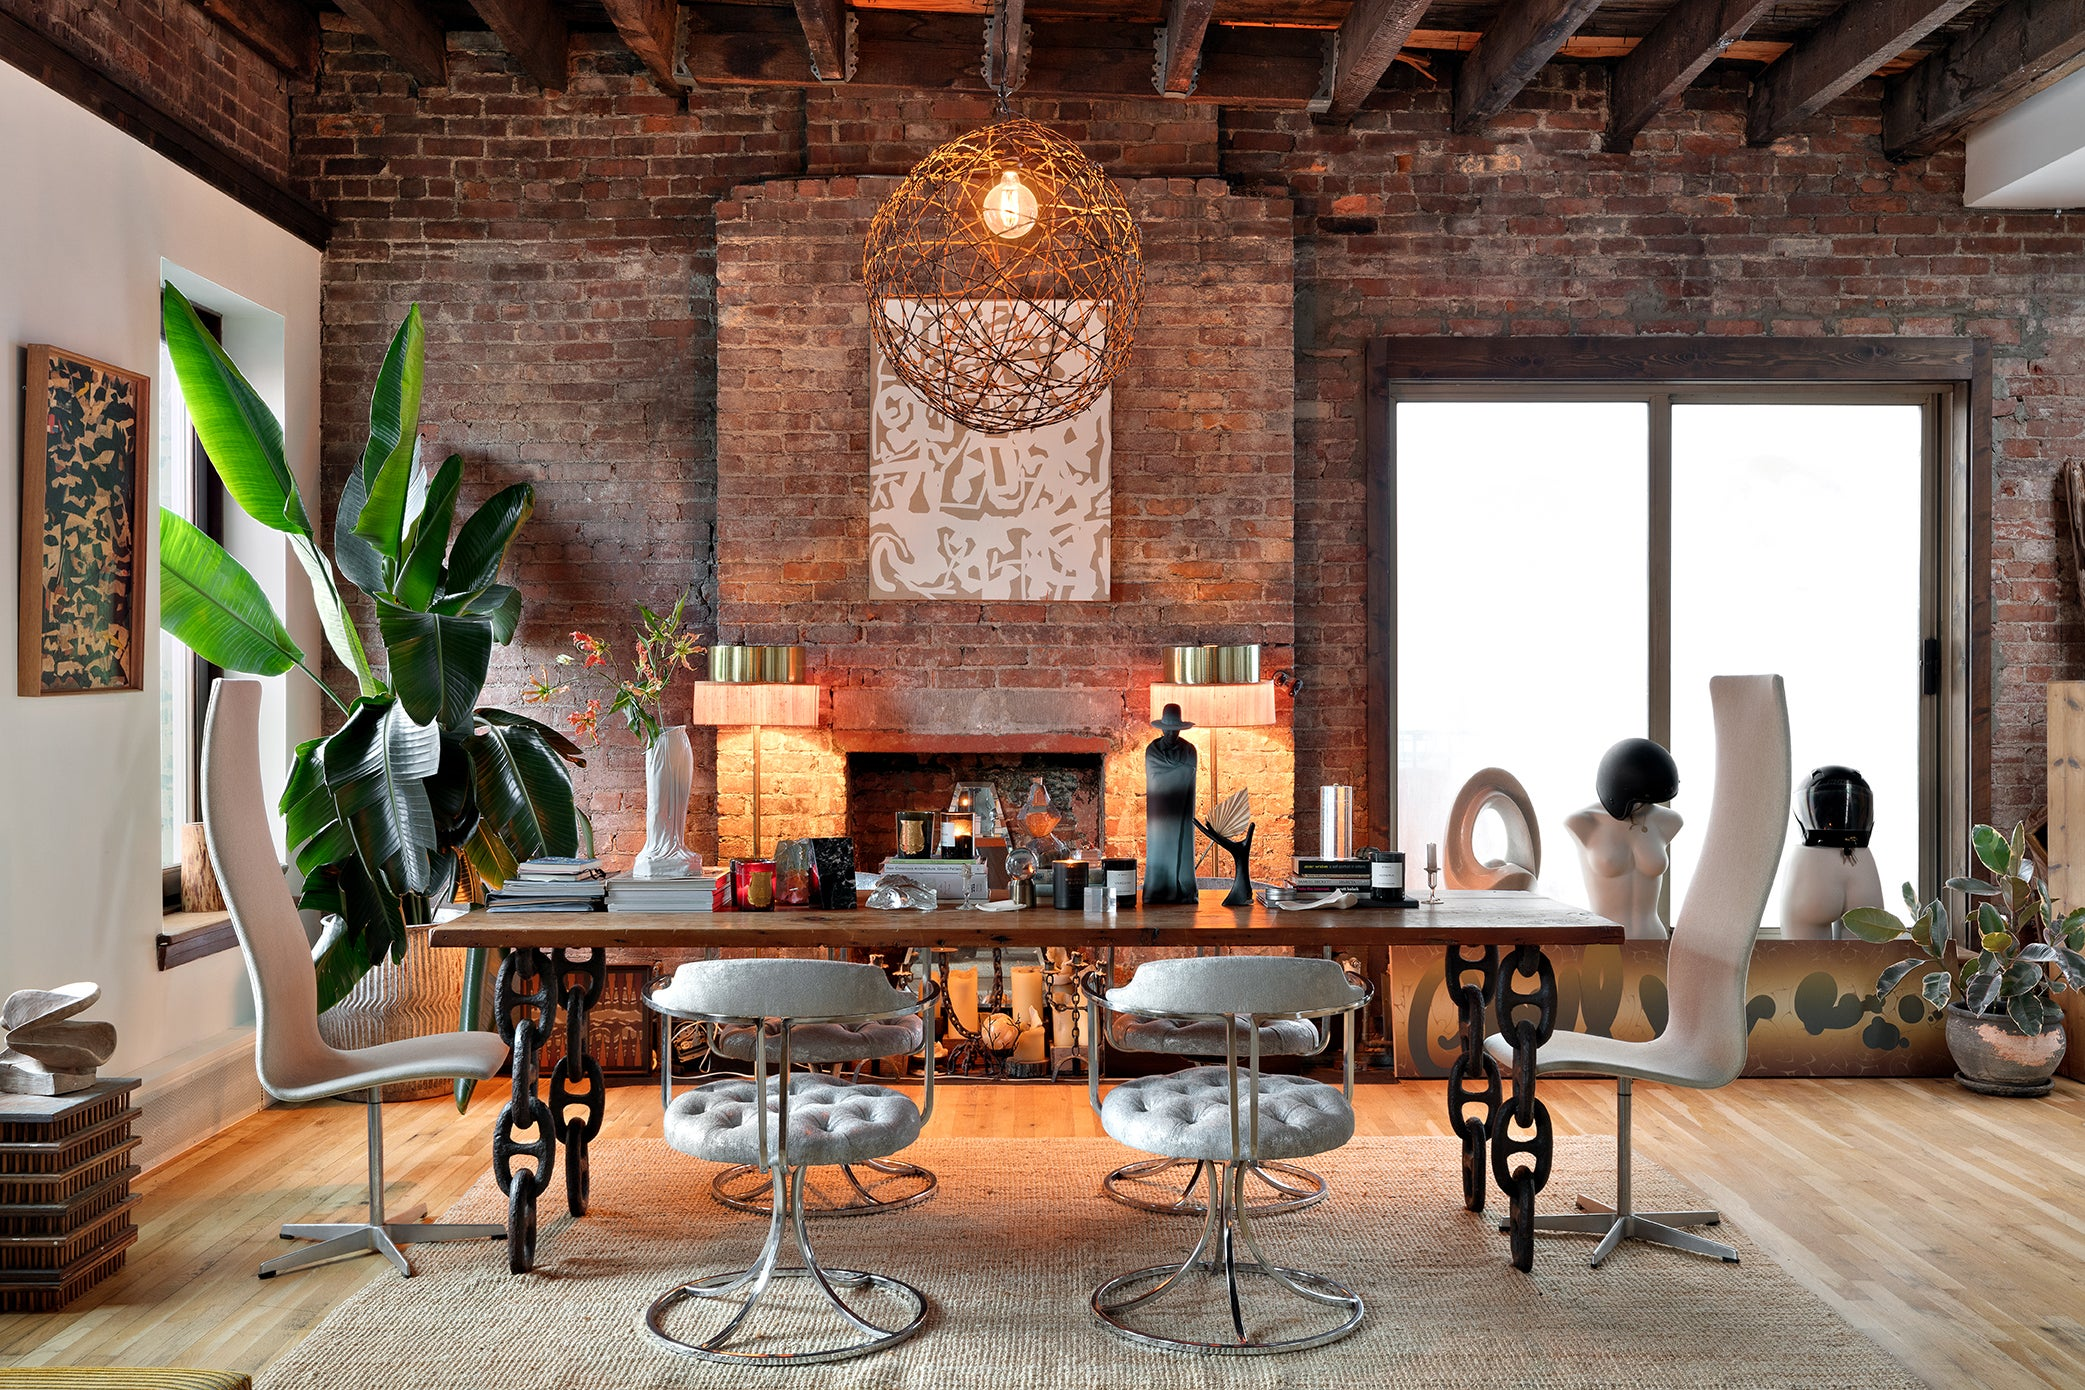 New York City loft designed by Evan Edward Interiors